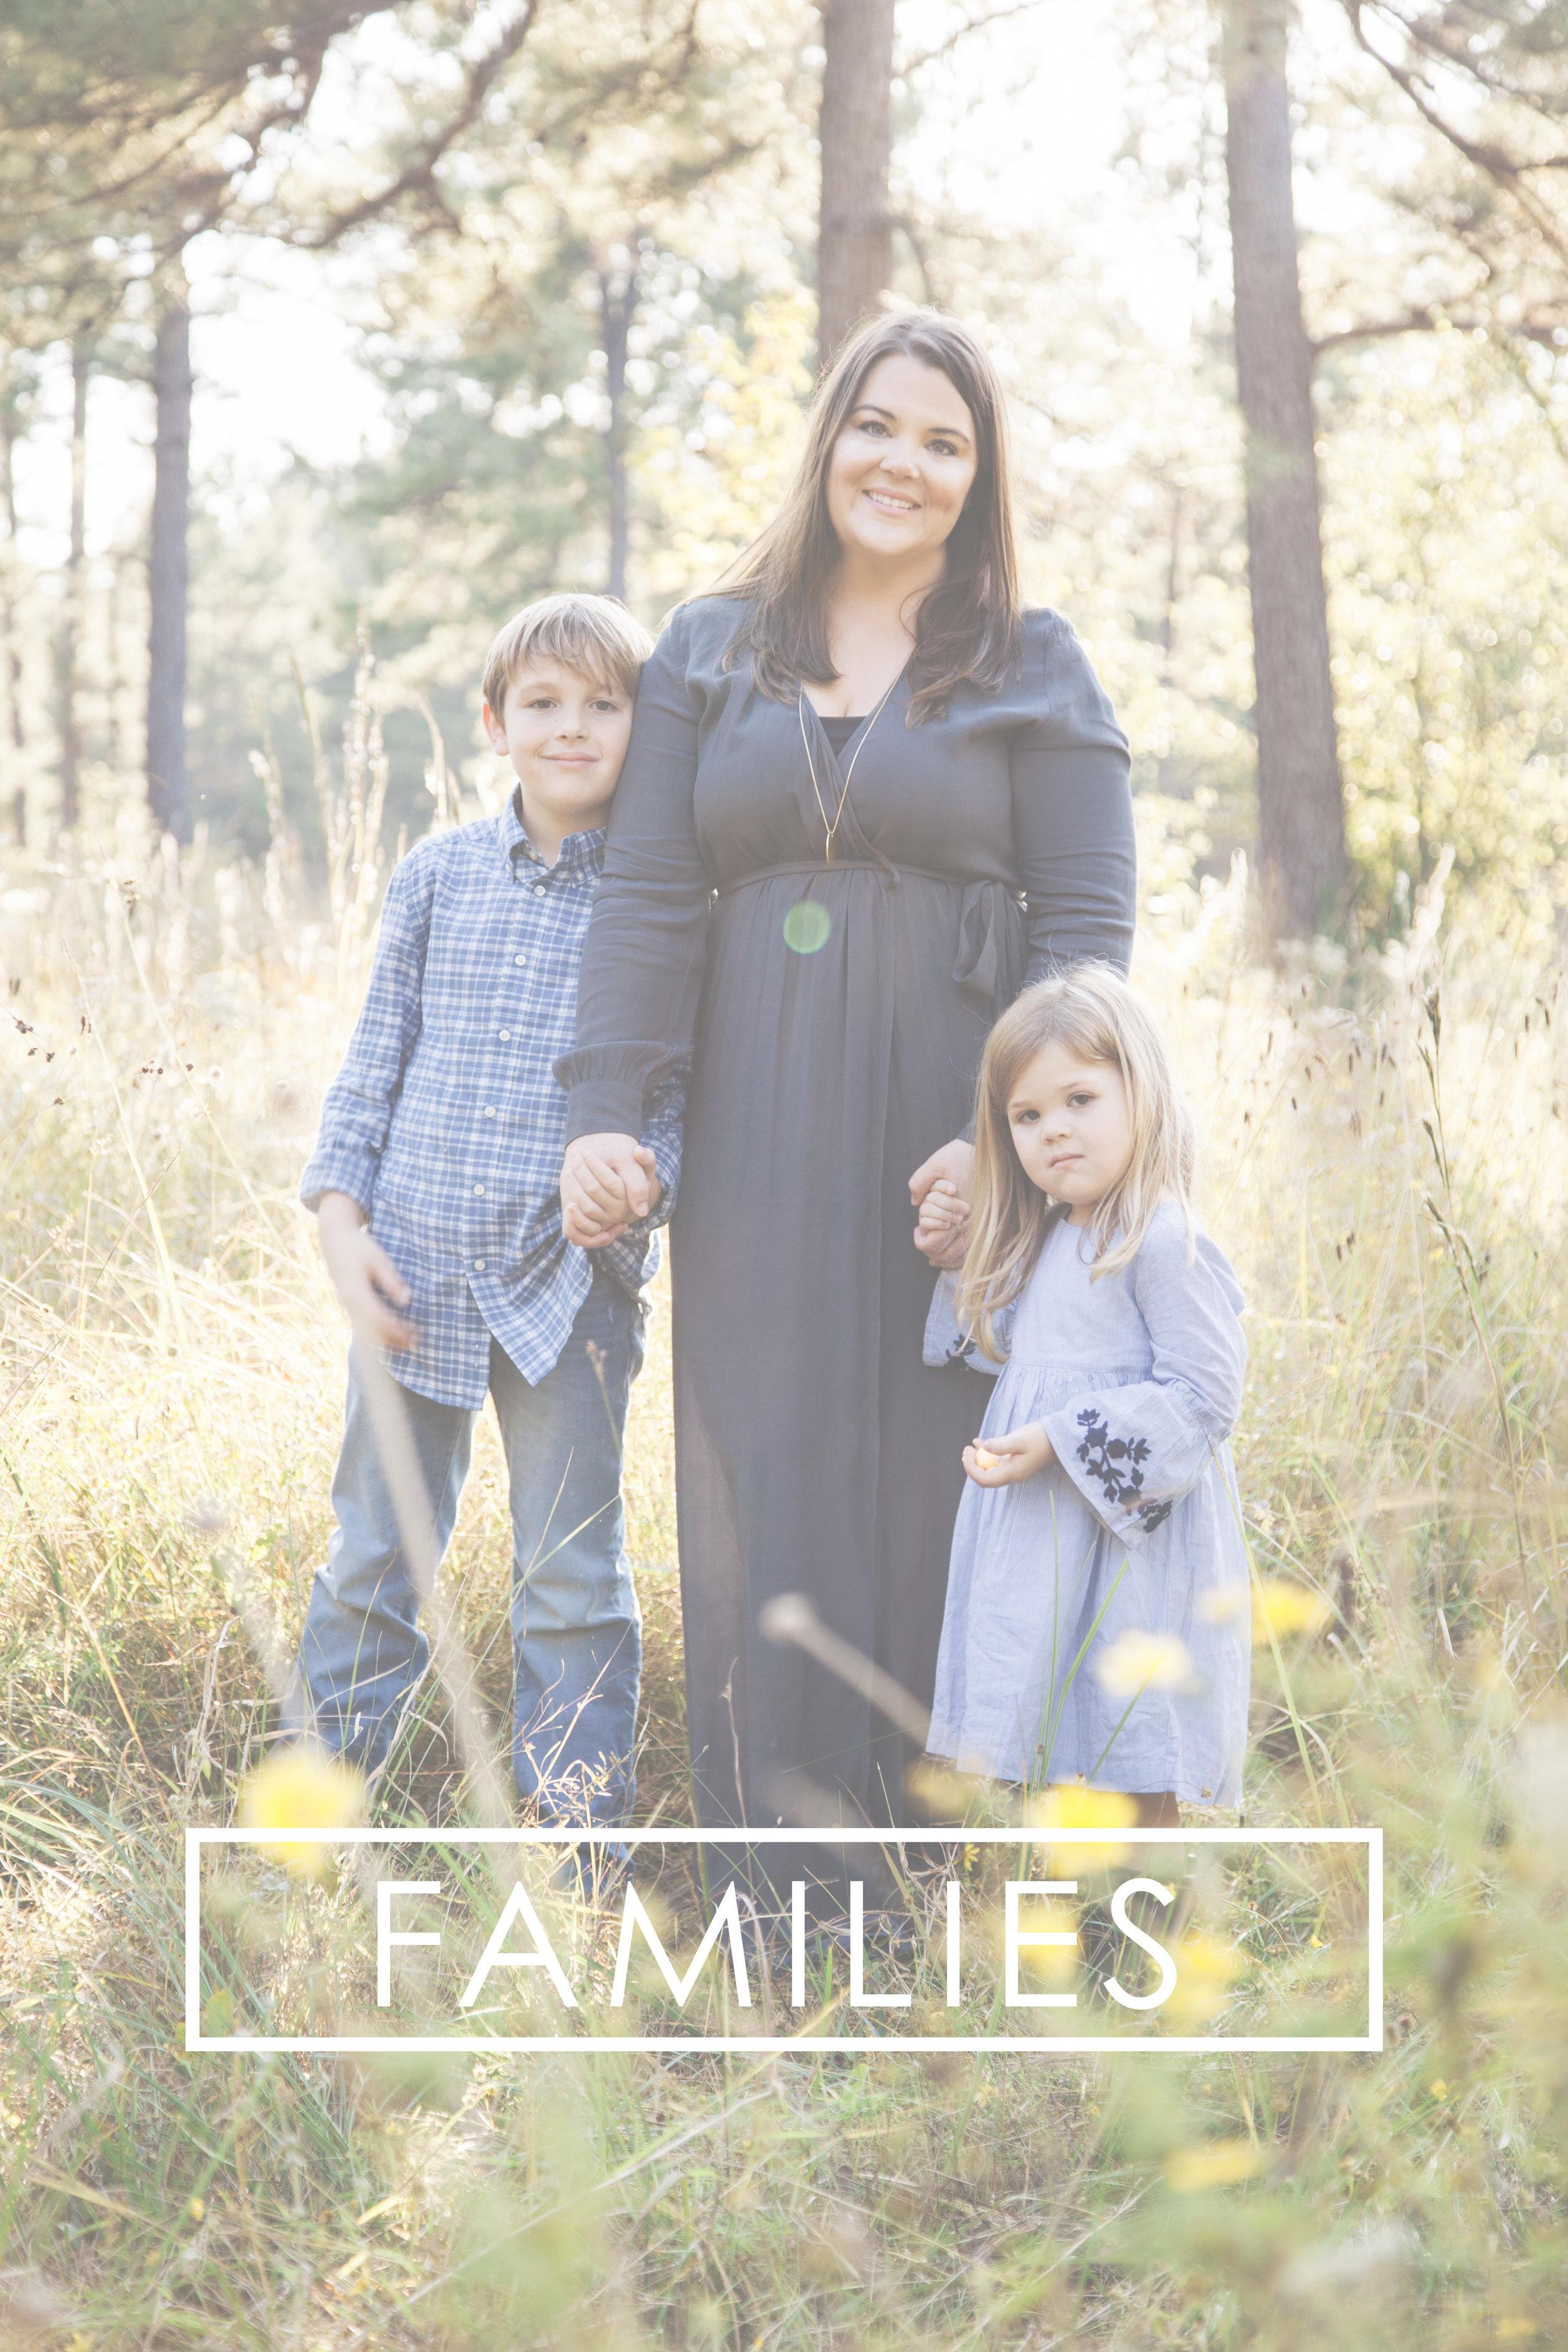 Familiesteaser.jpg